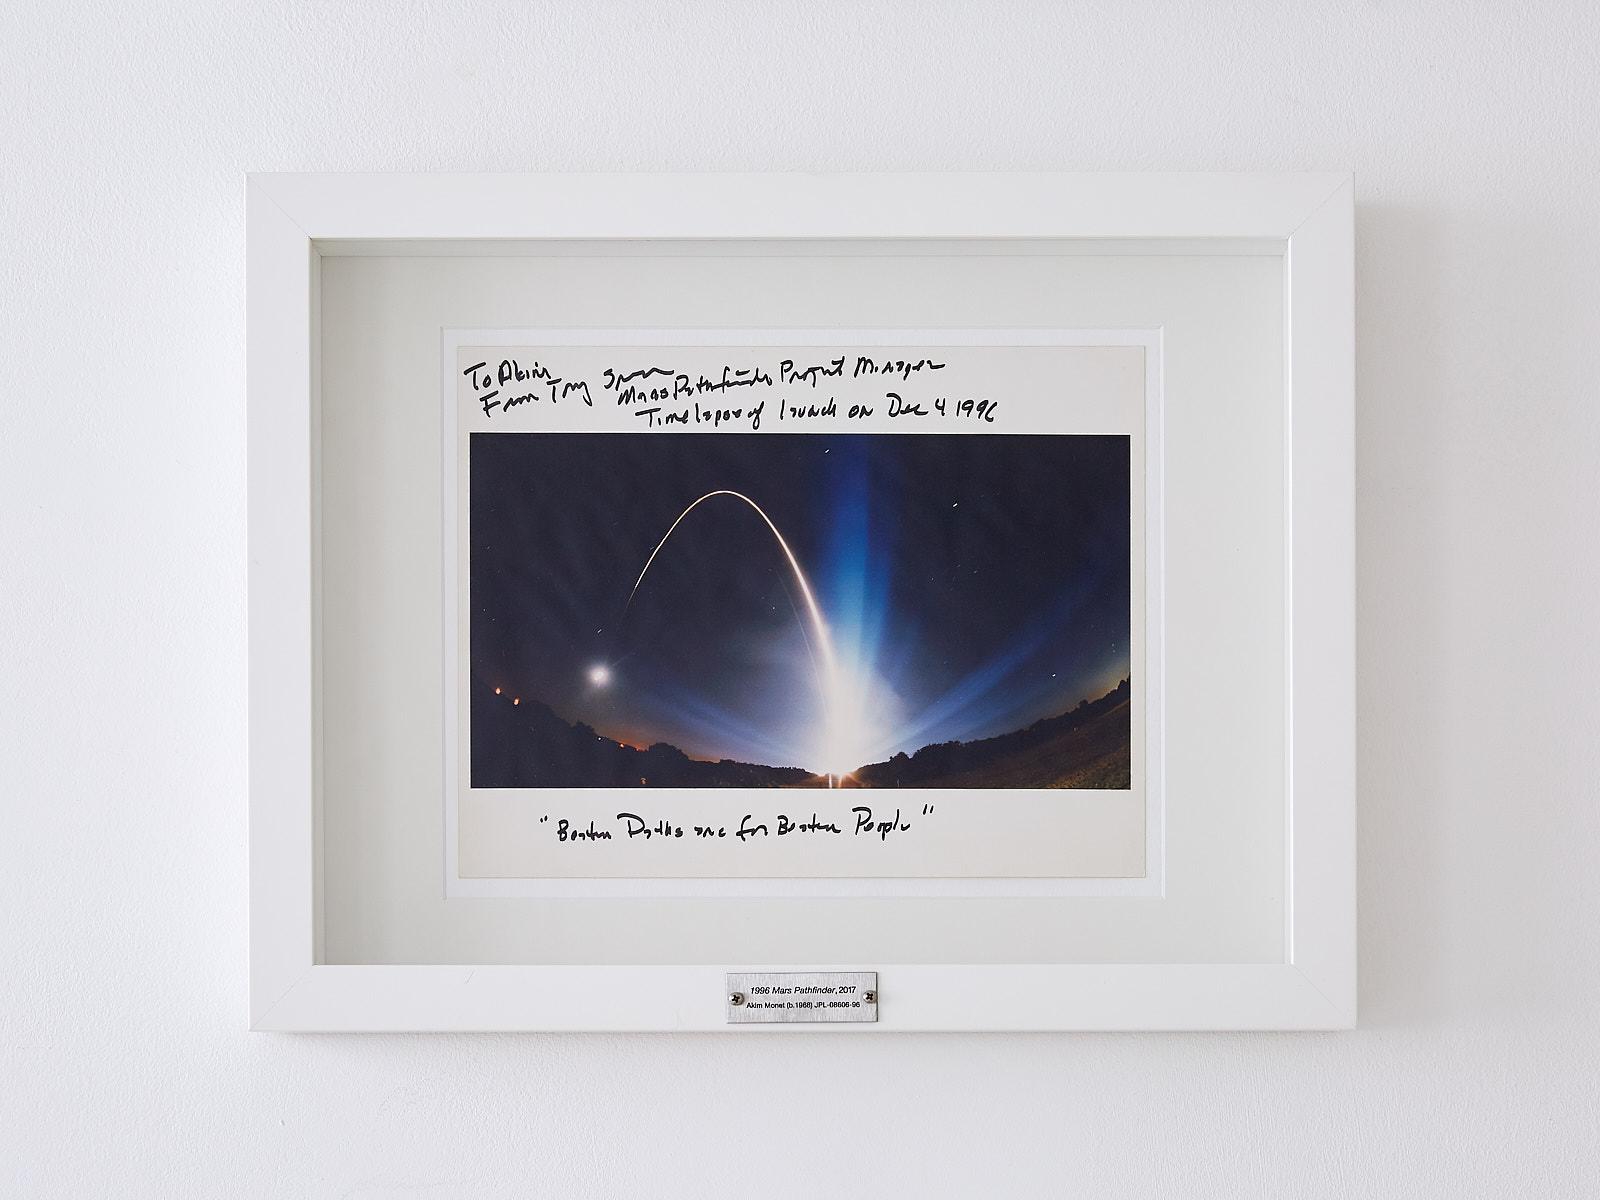 06-Akim-MONET-1996-Mars-Pathfinder